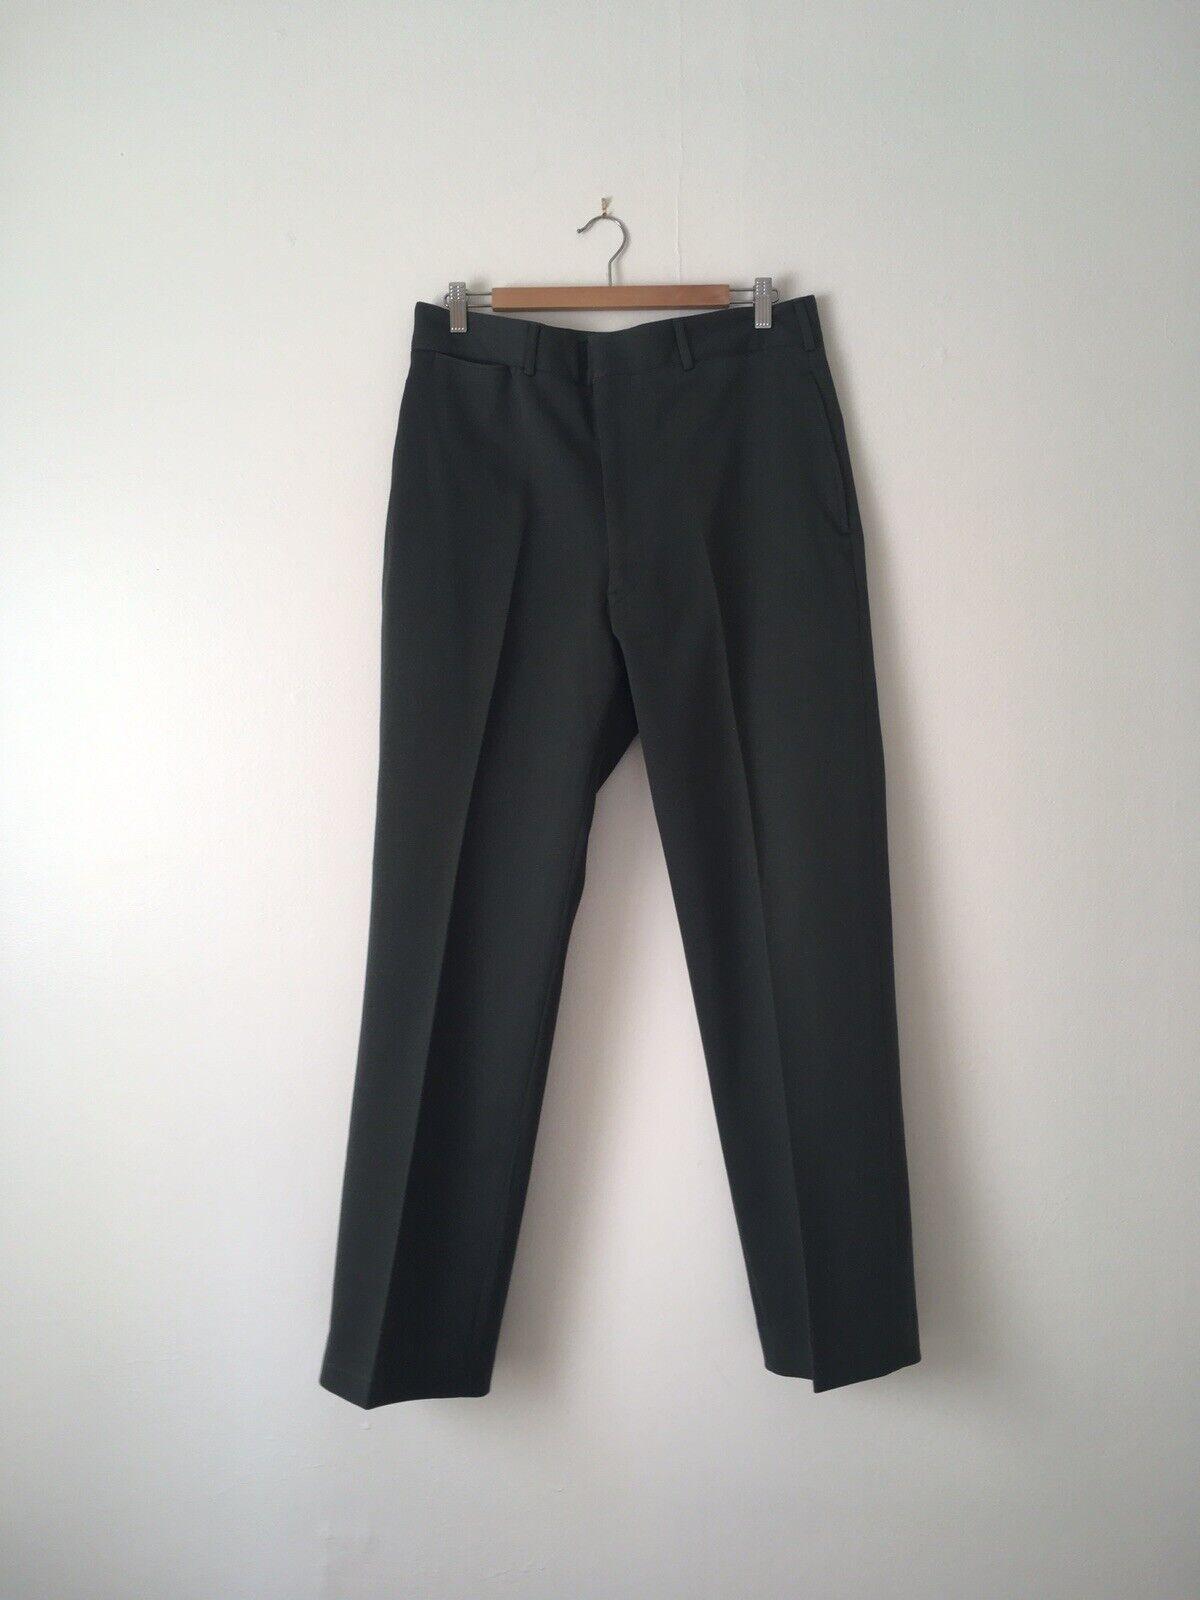 1960s Ceremonial Olive Wool Army Trousers Talon Zipper MIL-T-3982 Size 34 X 32